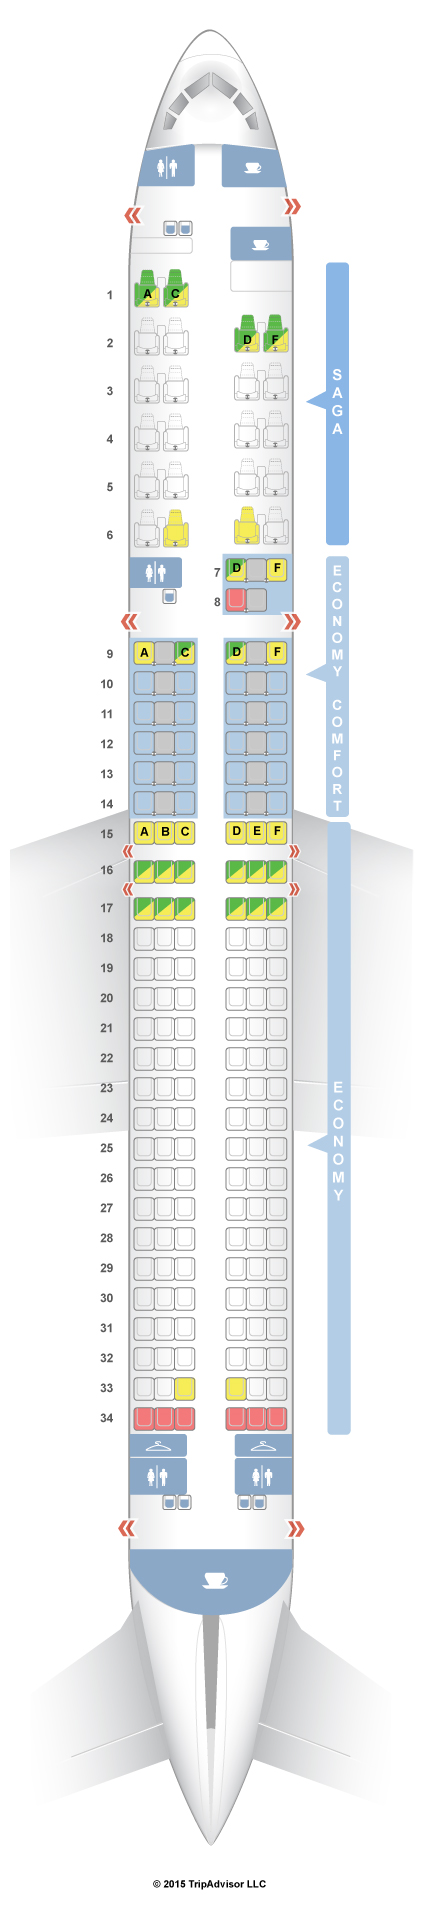 Seatguru Seat Map Icelandair Boeing 757 200 752 Seatguru Map Boeing